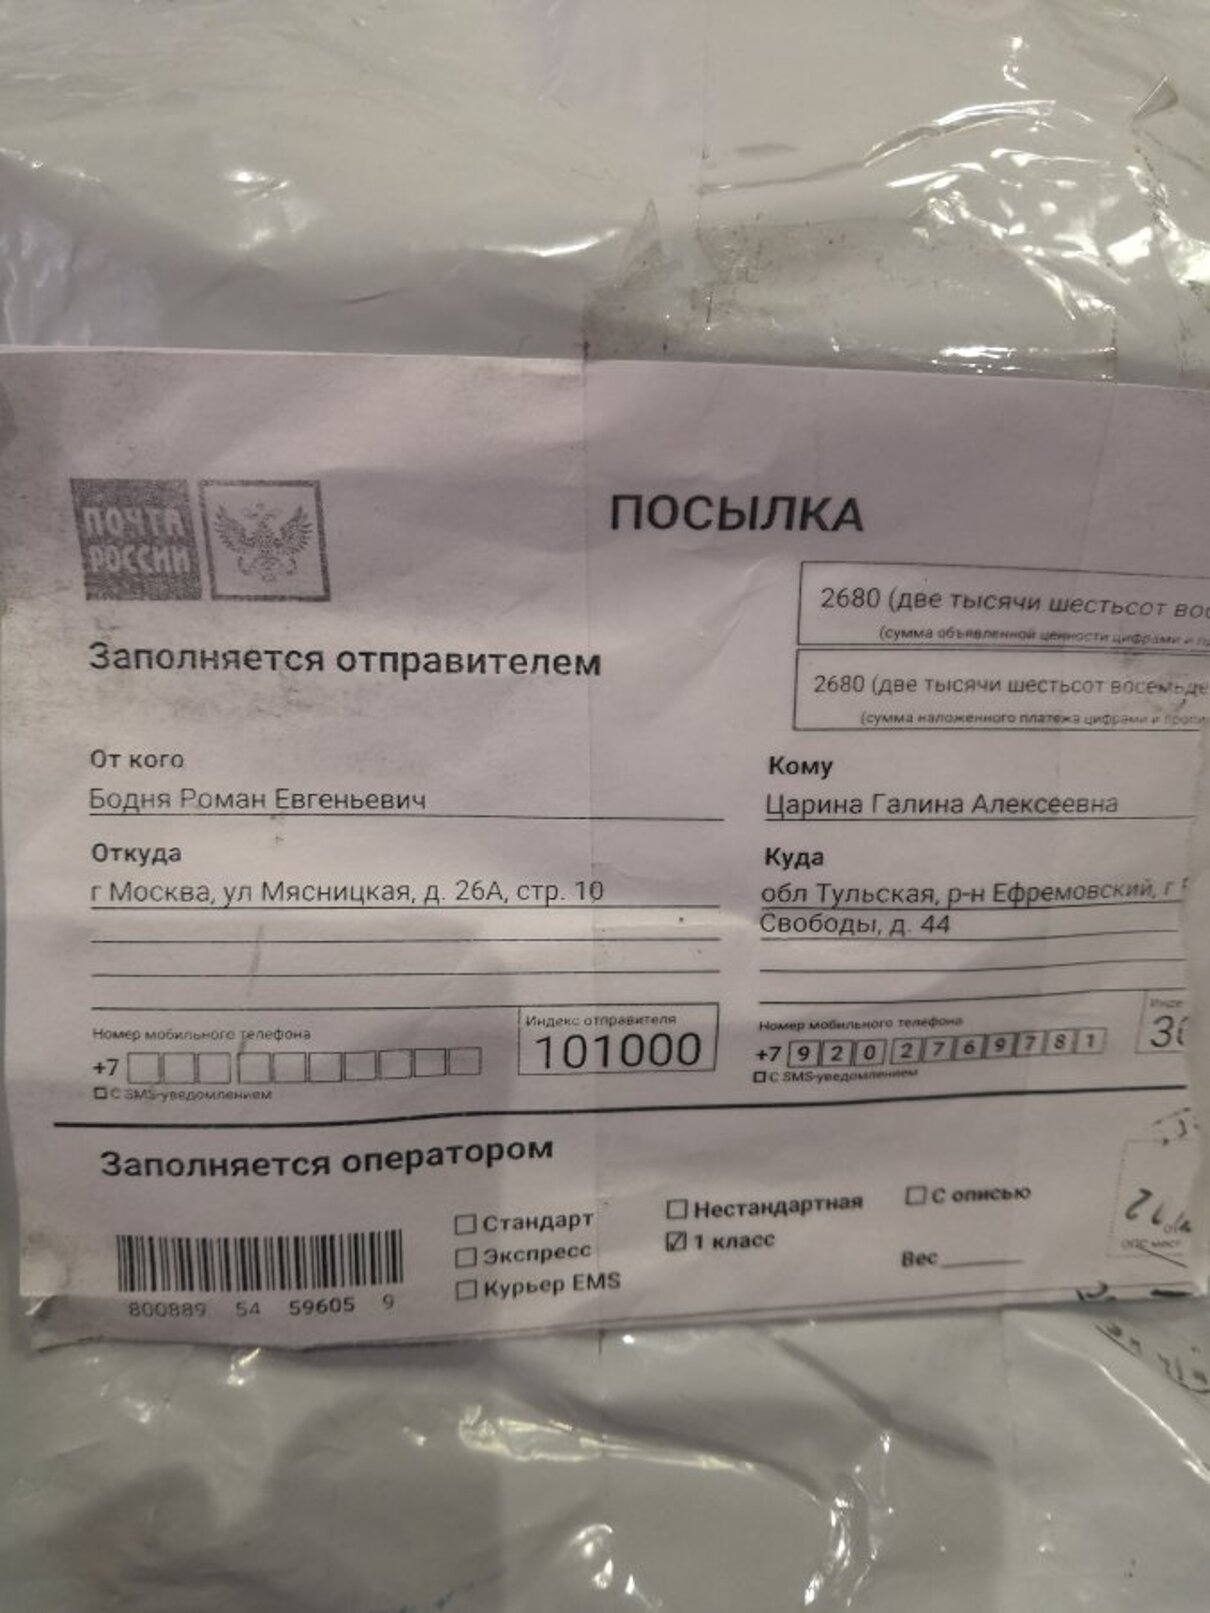 Жалоба-отзыв: Бодня Роман Евгеньевич - Не тот товар.  Фото №2